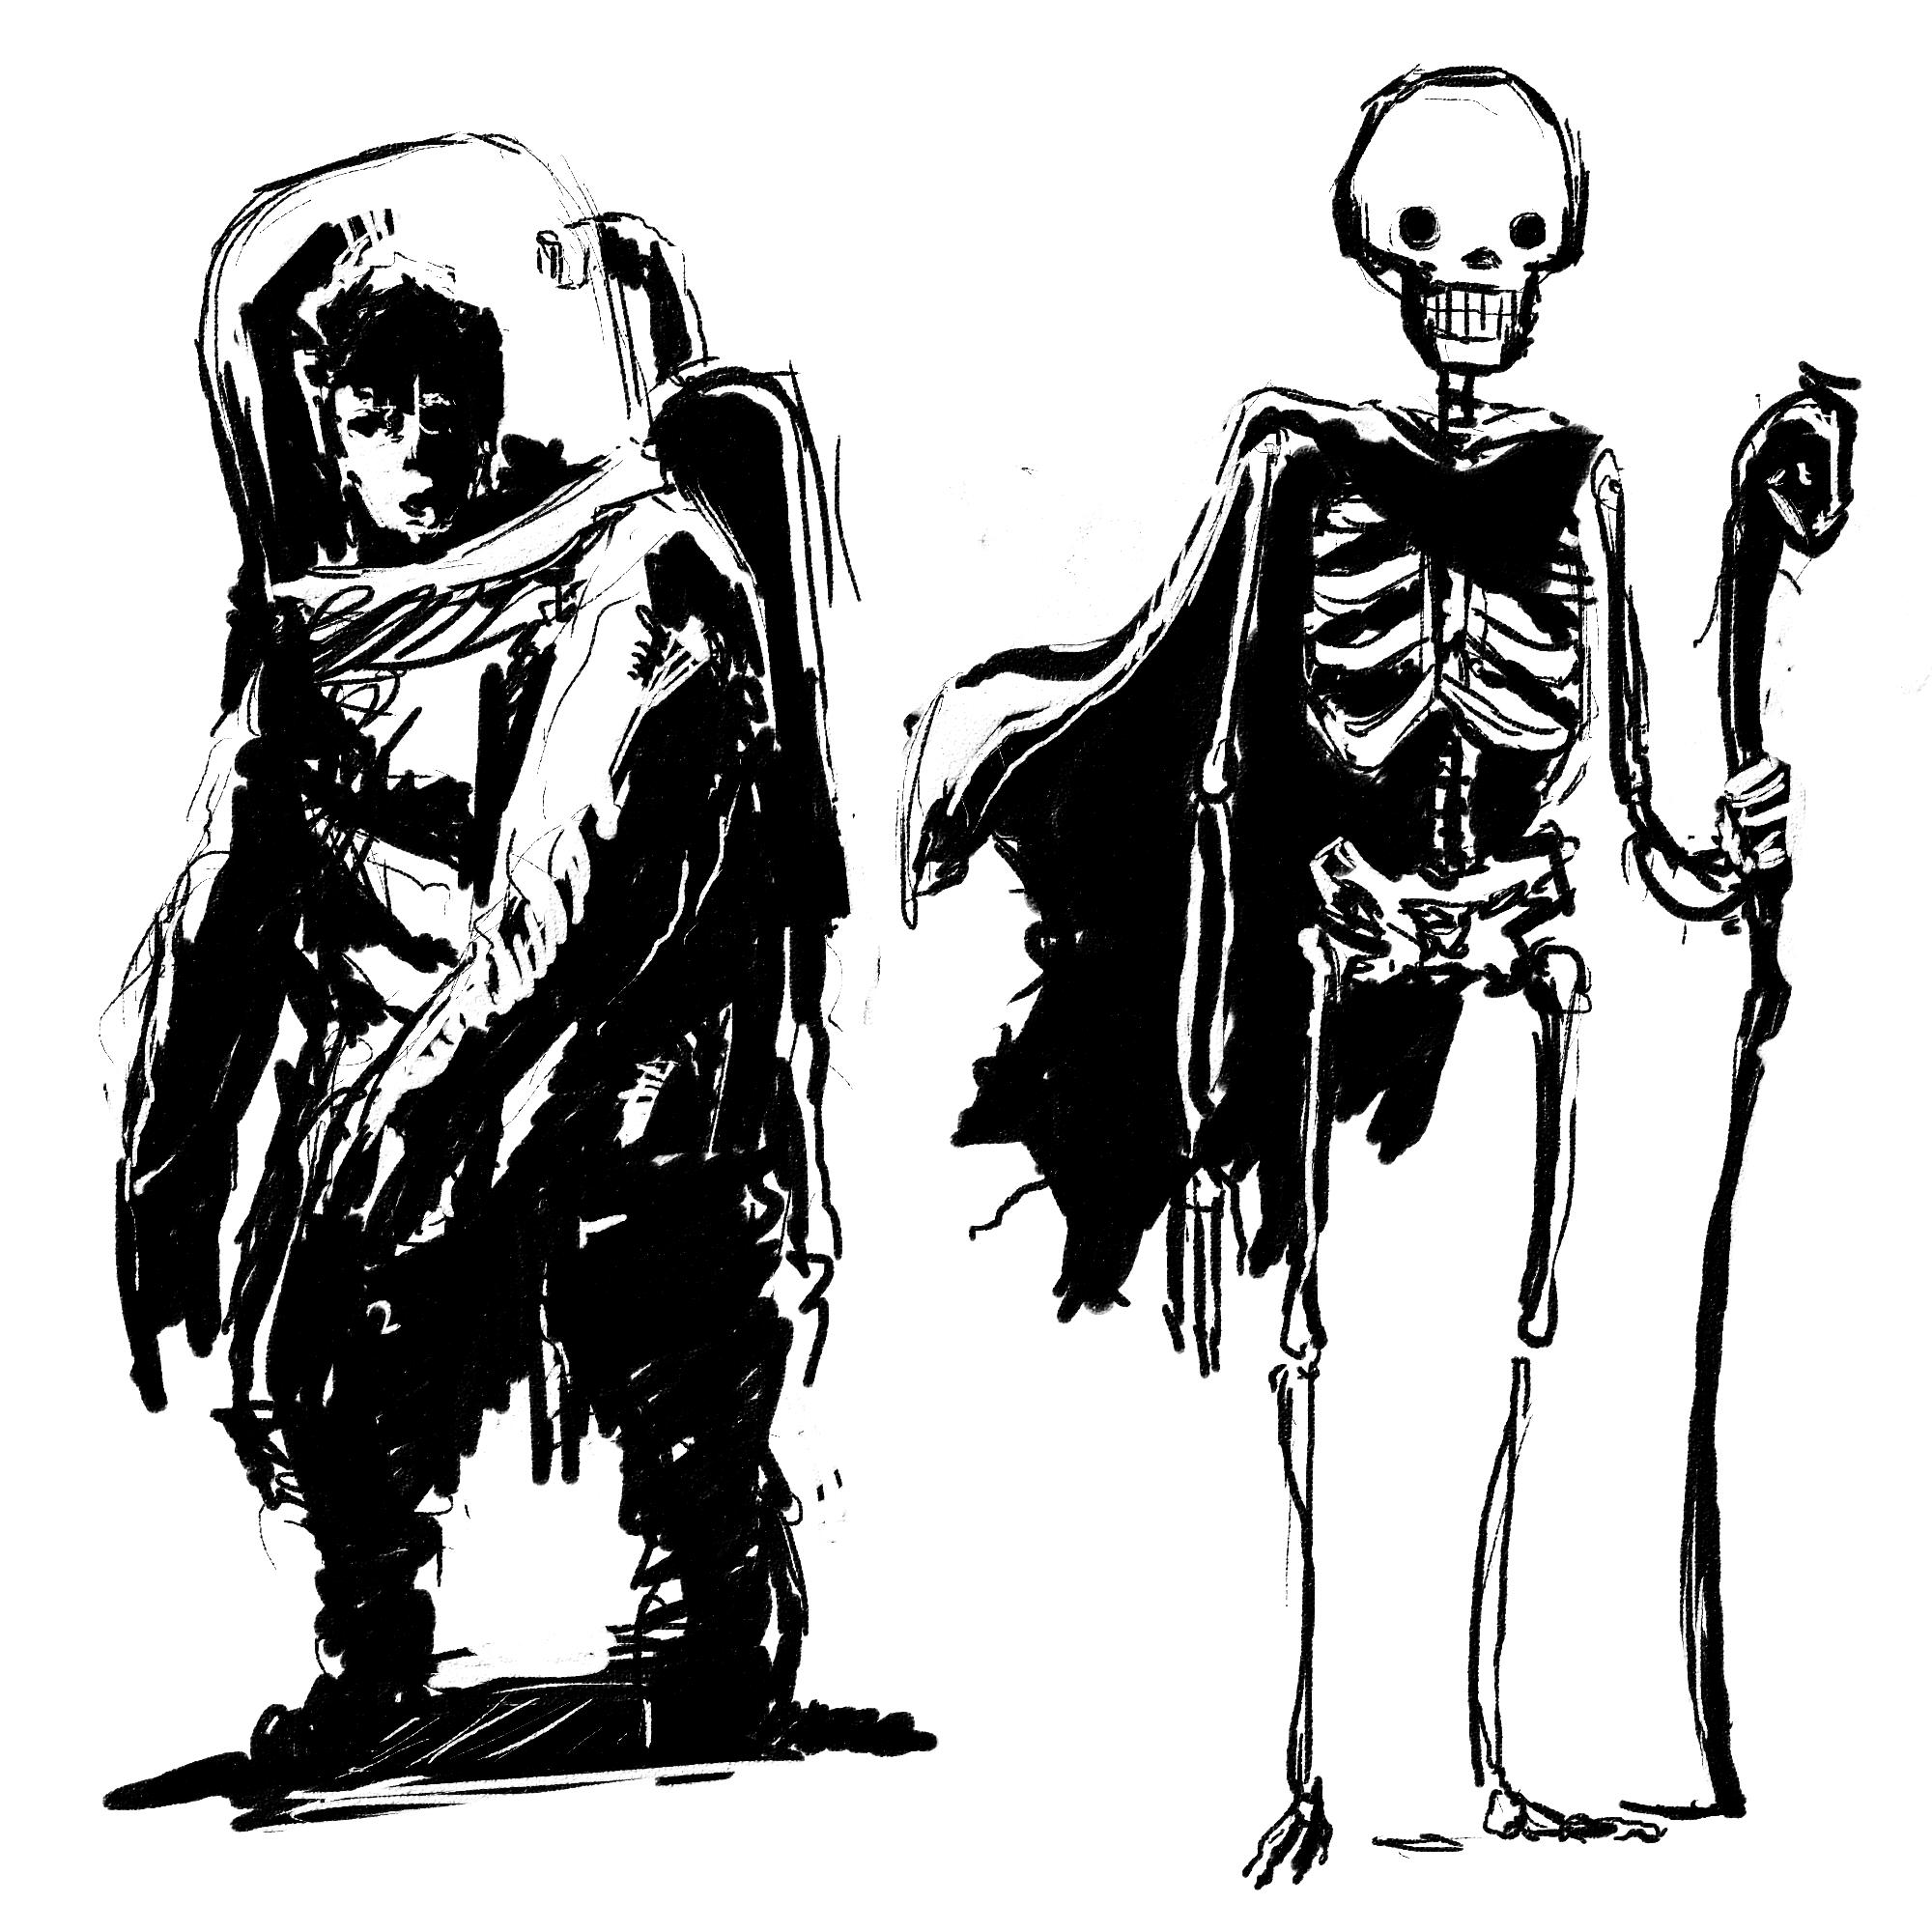 character sketch stuff